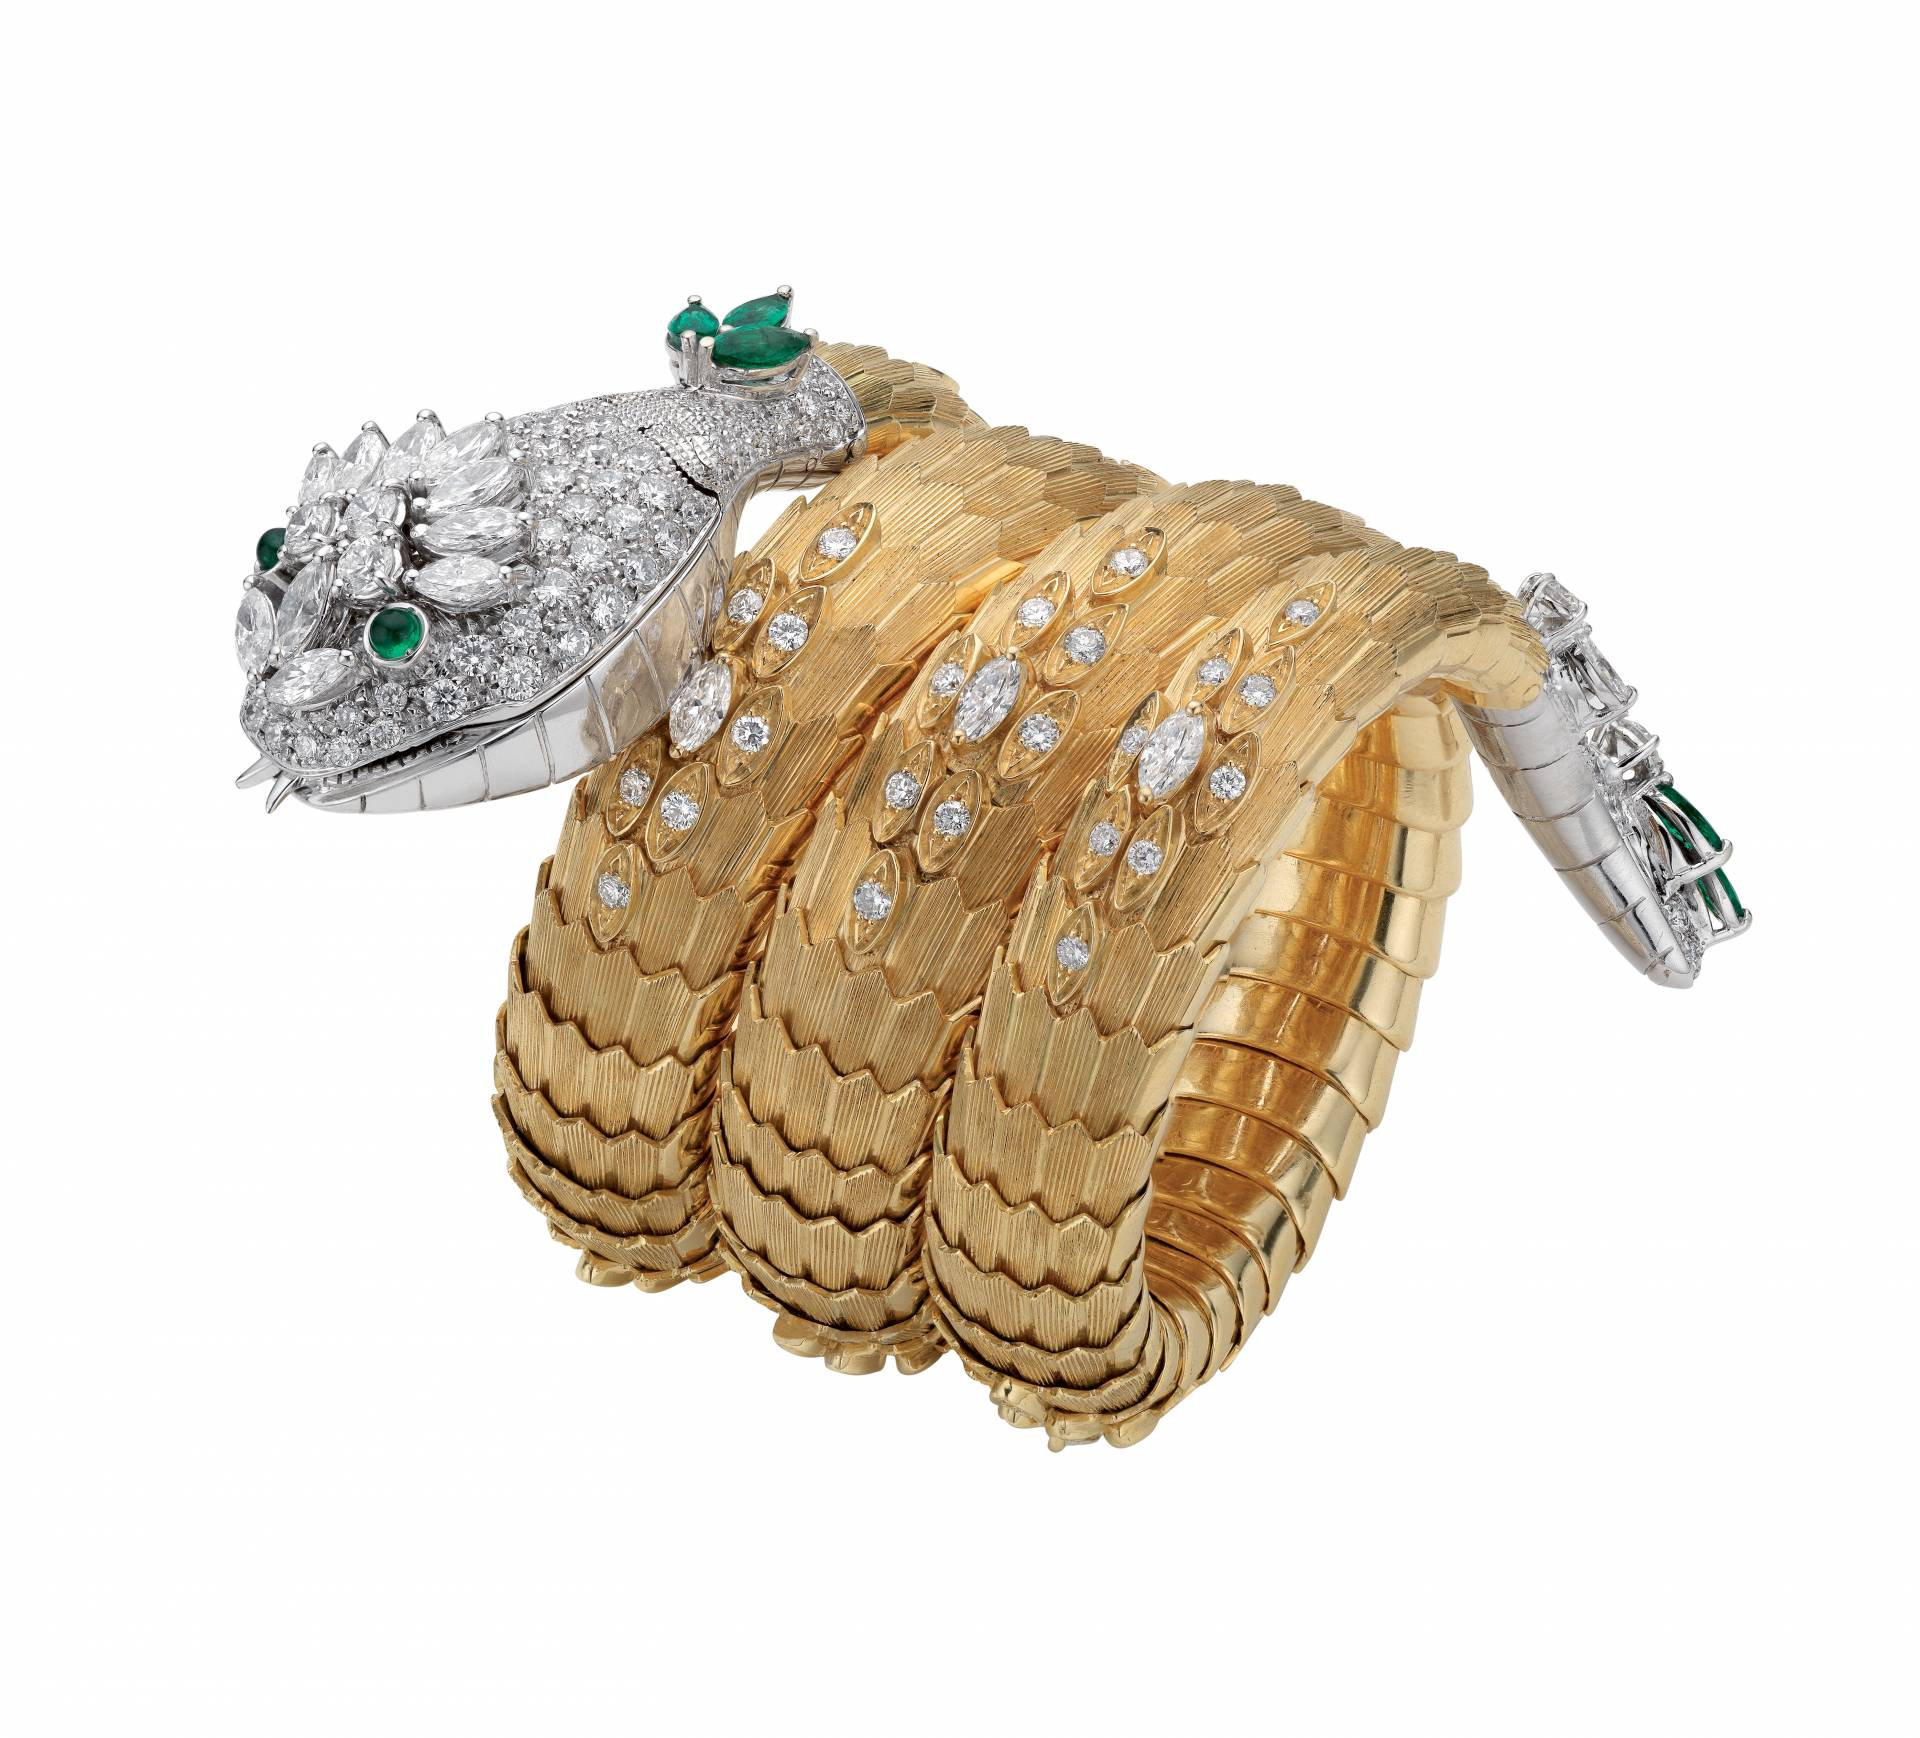 Brazalete 'Snake' (1967) de Bulgari en oro amarillo, diamantes y esmeraldas.